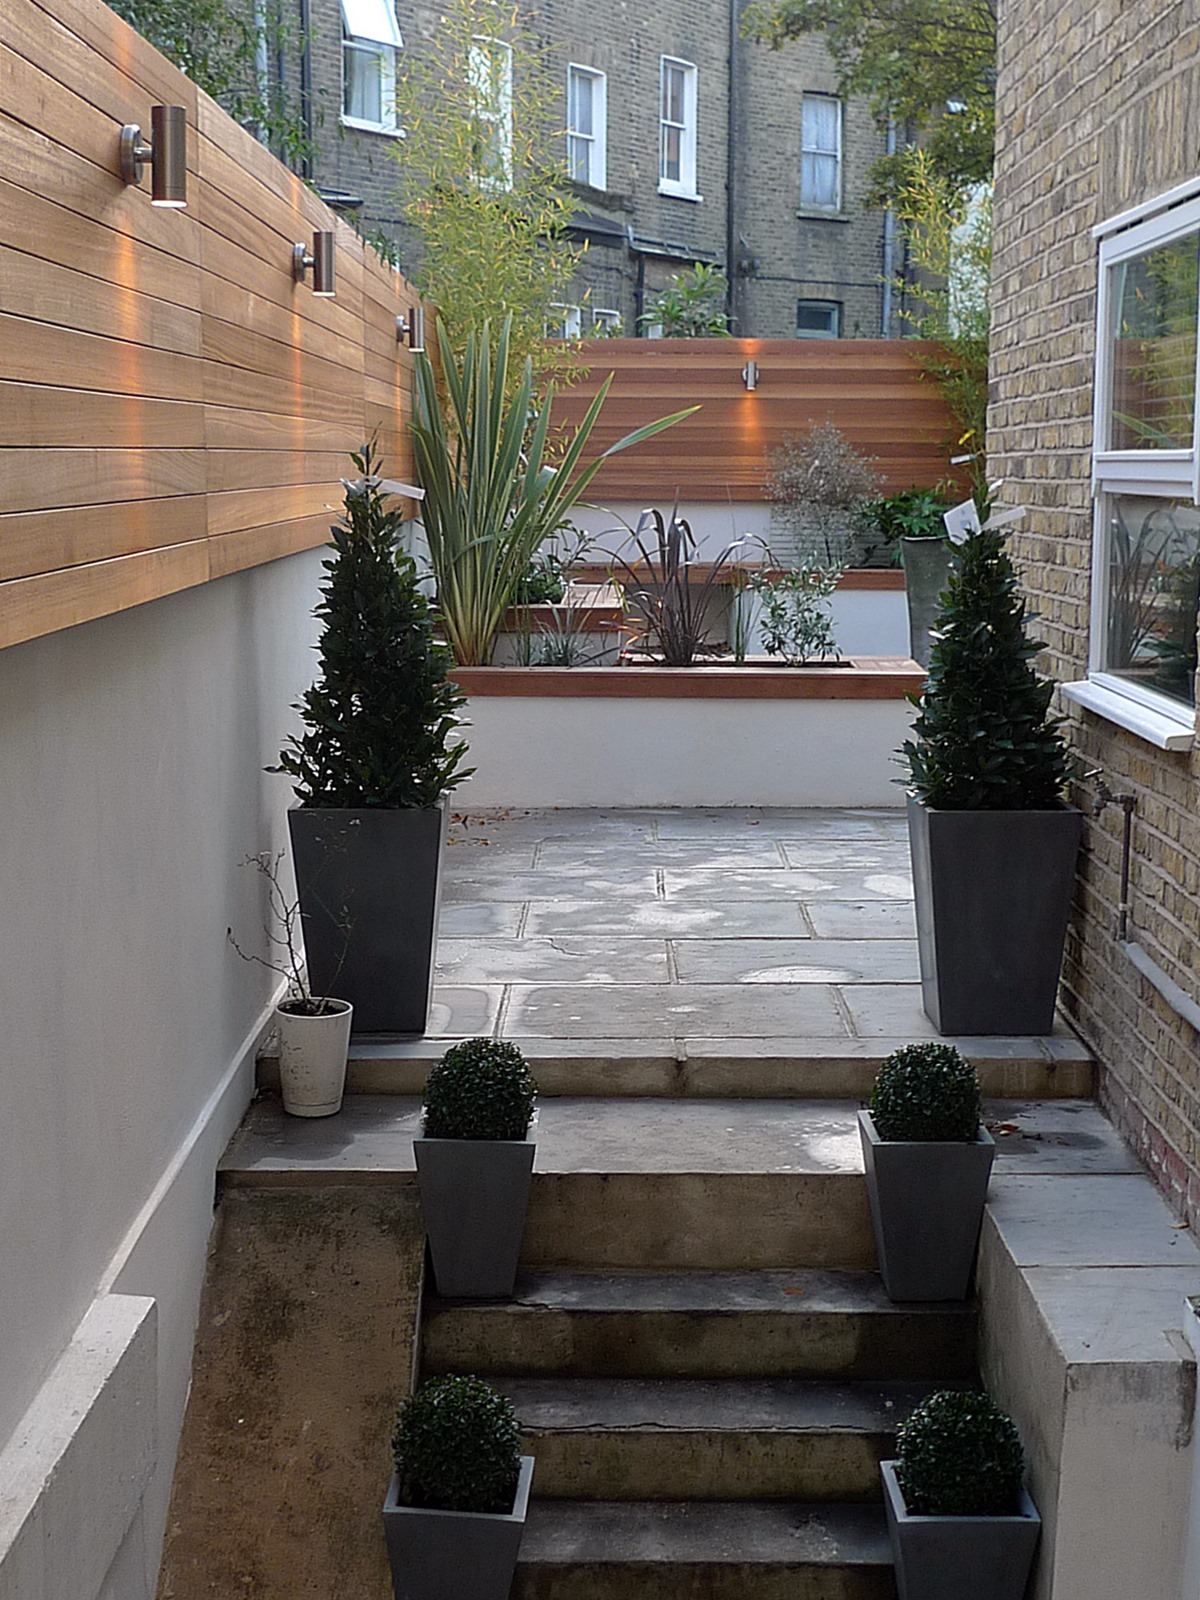 modern london courtyard low maintenance urban outdoor indoor living garden space paving screens planting bench raised beds (2)